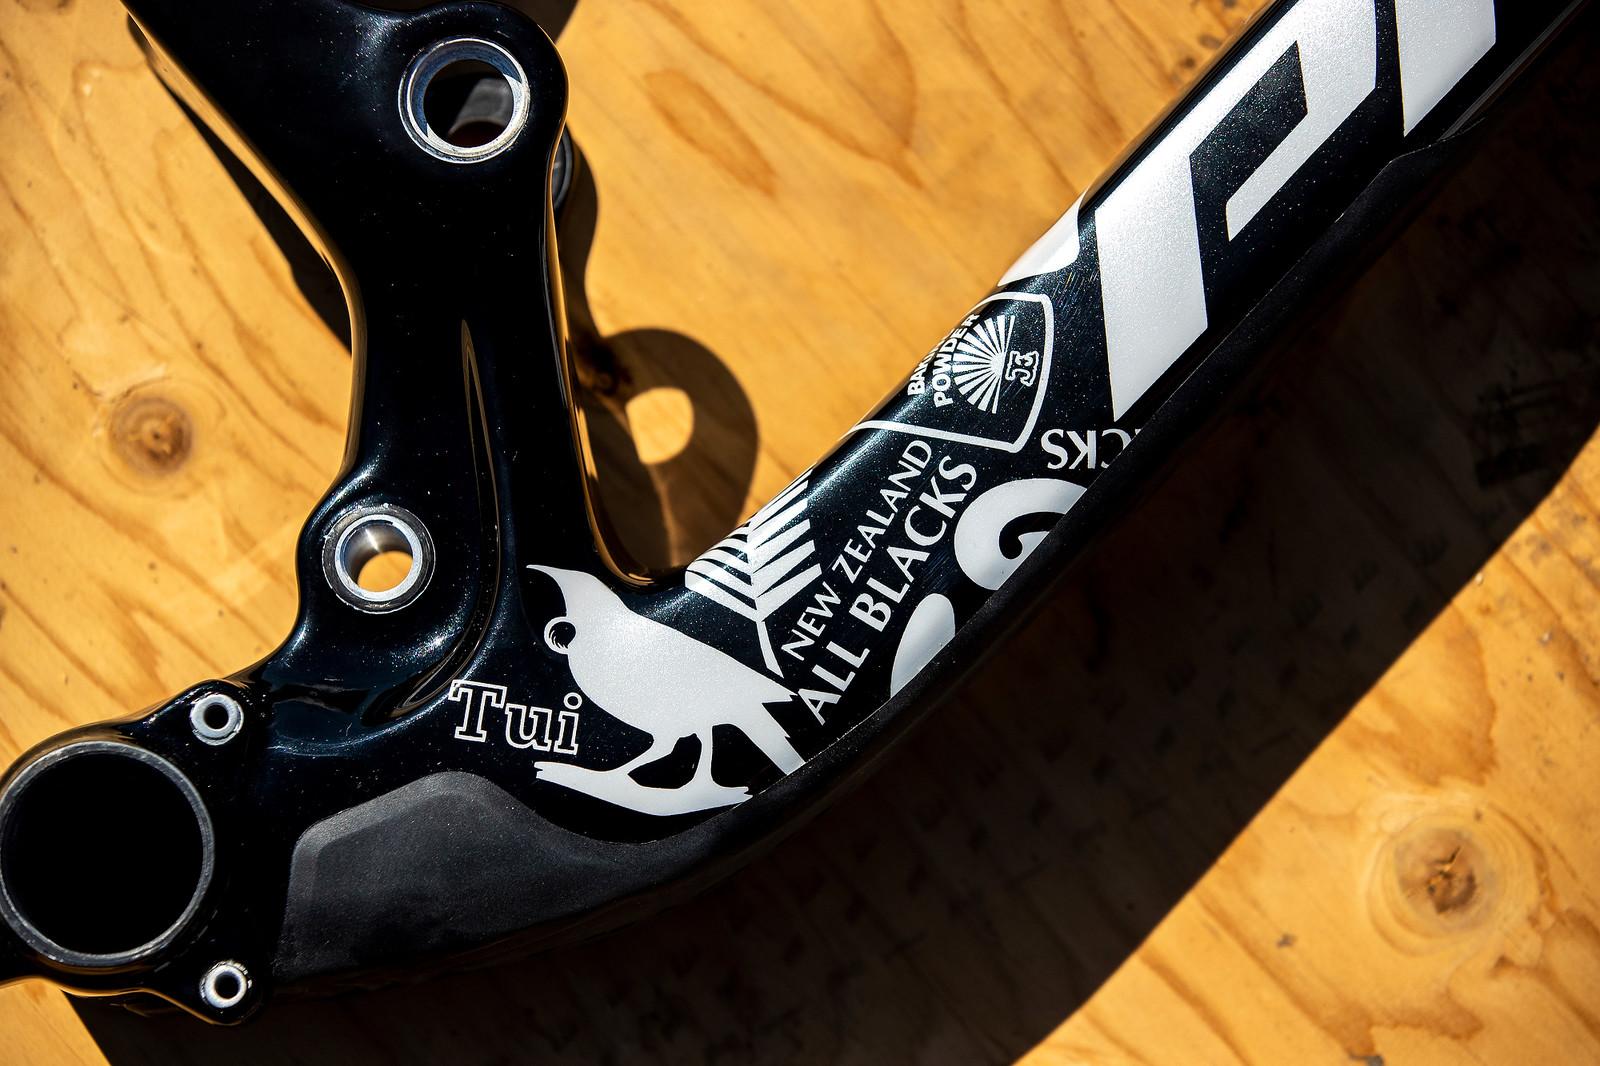 Eddie Masters' Pivot - PIT BITS - 2019 Mountain Bike World Championships Mont-Sainte-Anne - Mountain Biking Pictures - Vital MTB